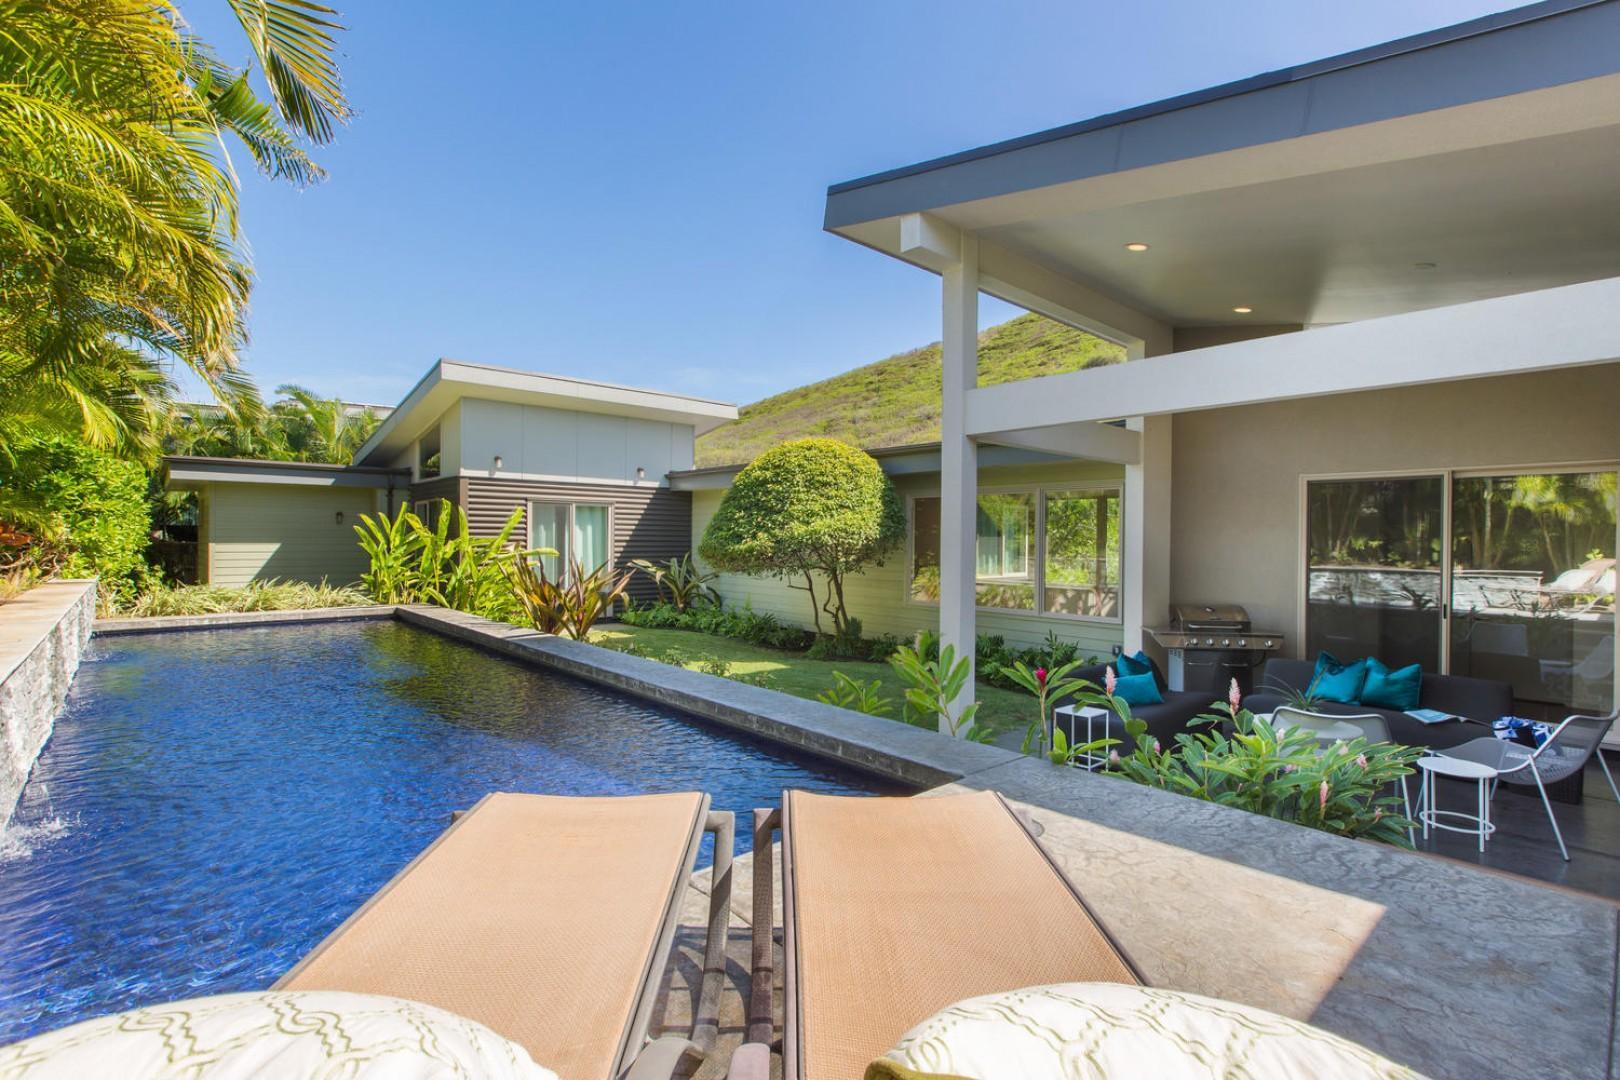 Backyard lap pool and covered lanai